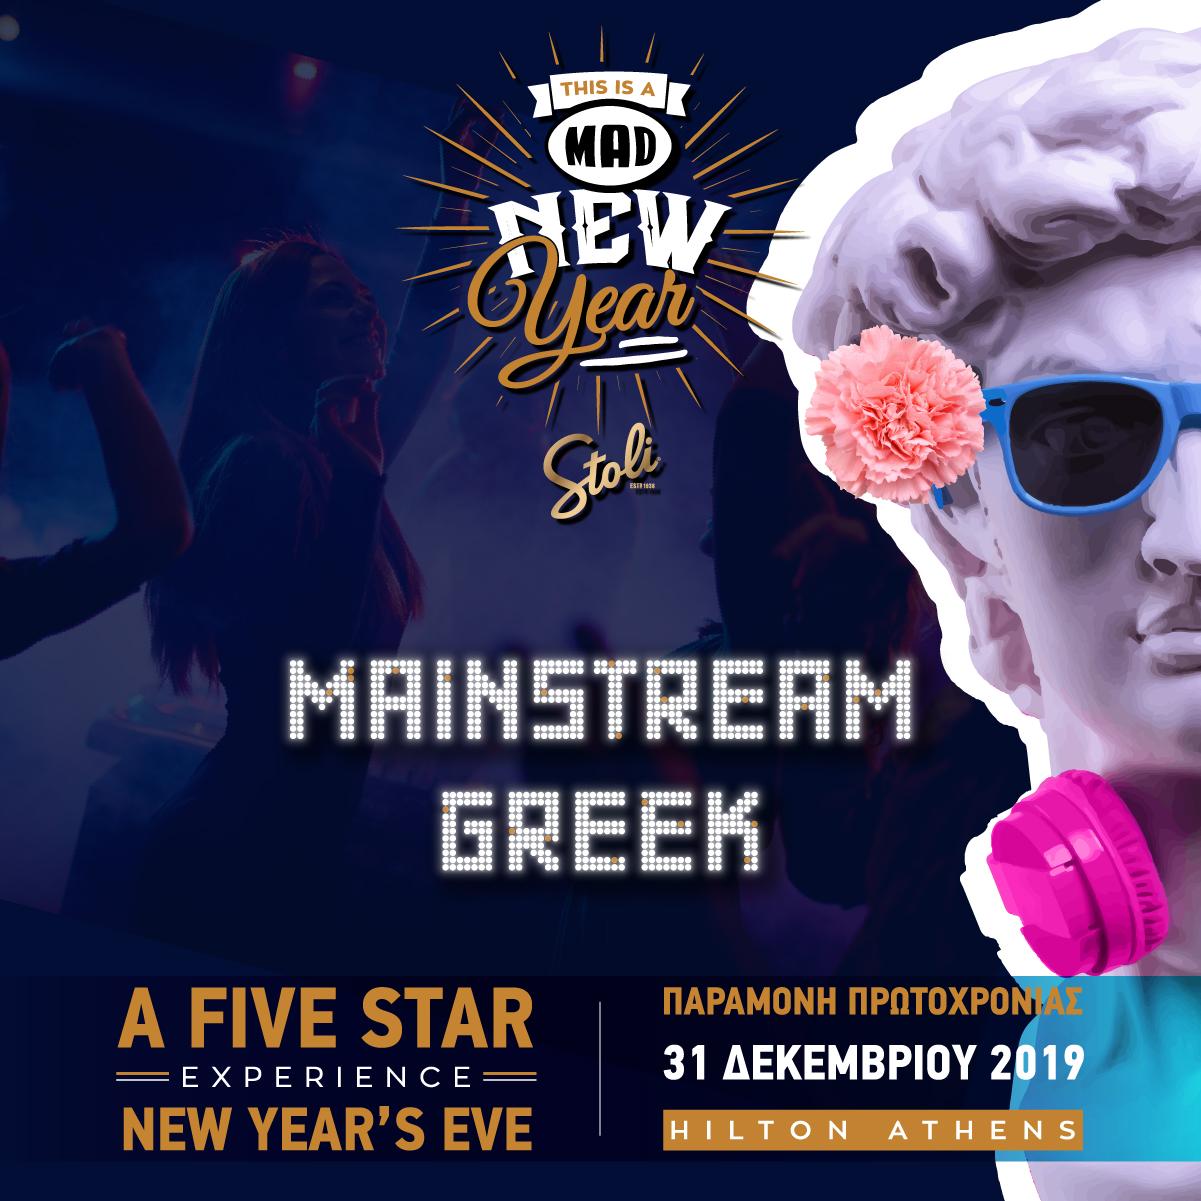 A Five Mainstream Greek Star Experience